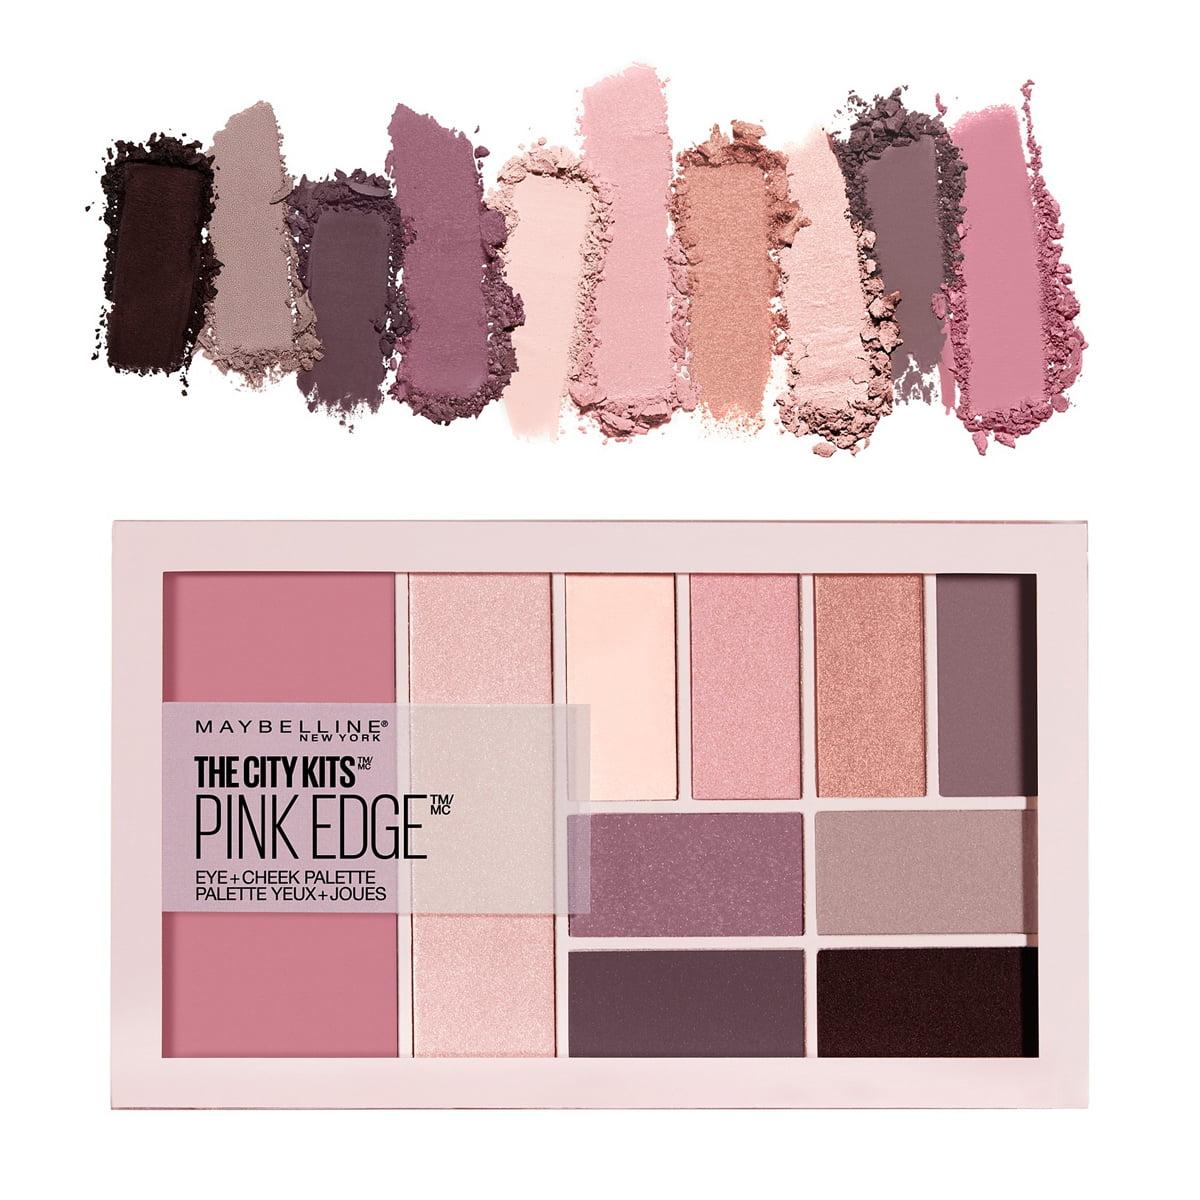 (3 Pack) MAYBELLINE The City Kits Eye + Cheek Palette - Pink Edge